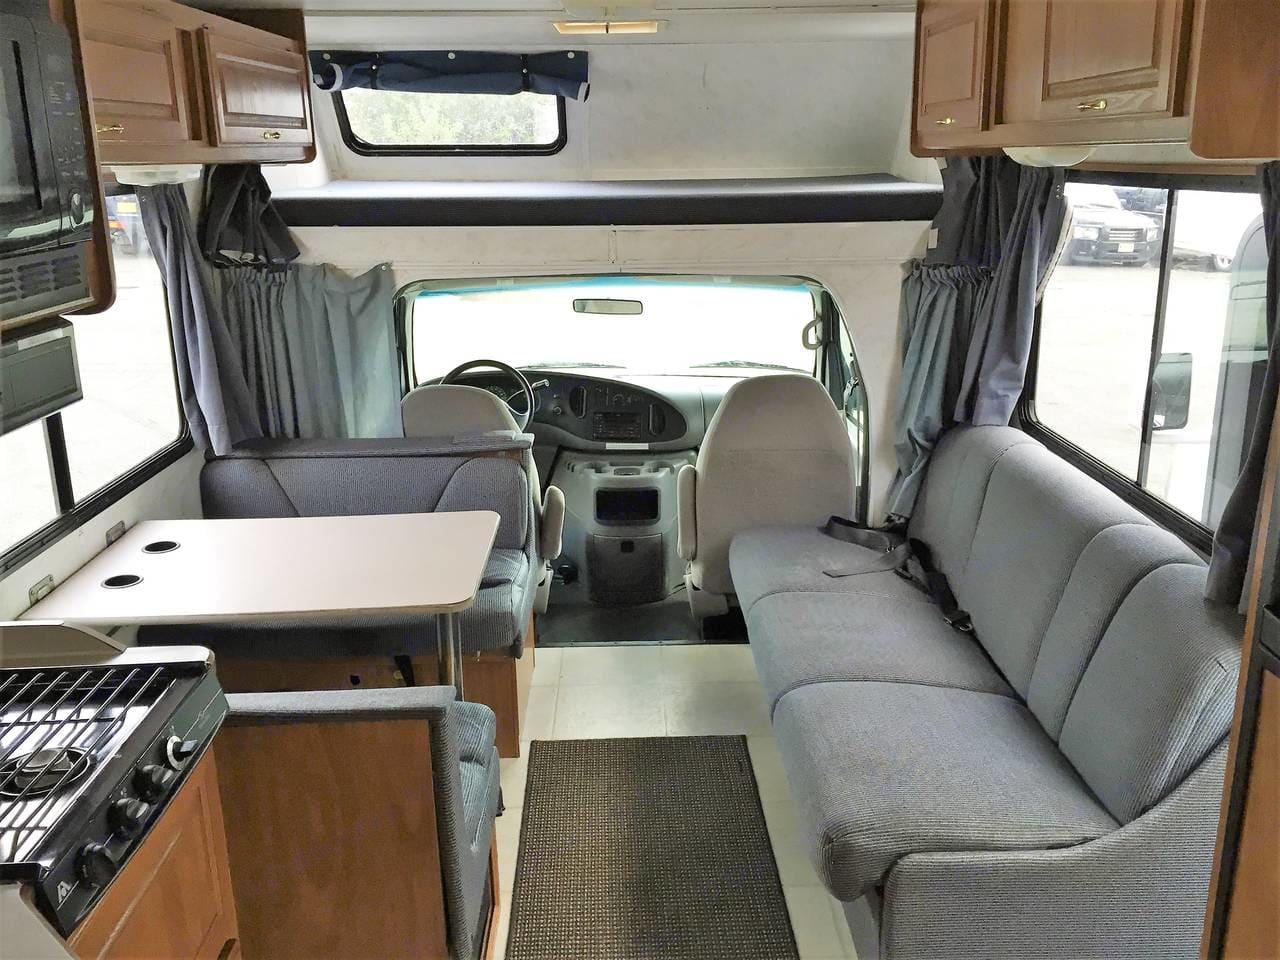 Interior facing forwards. Thor Motor Coach Four Winds Majestic 2003